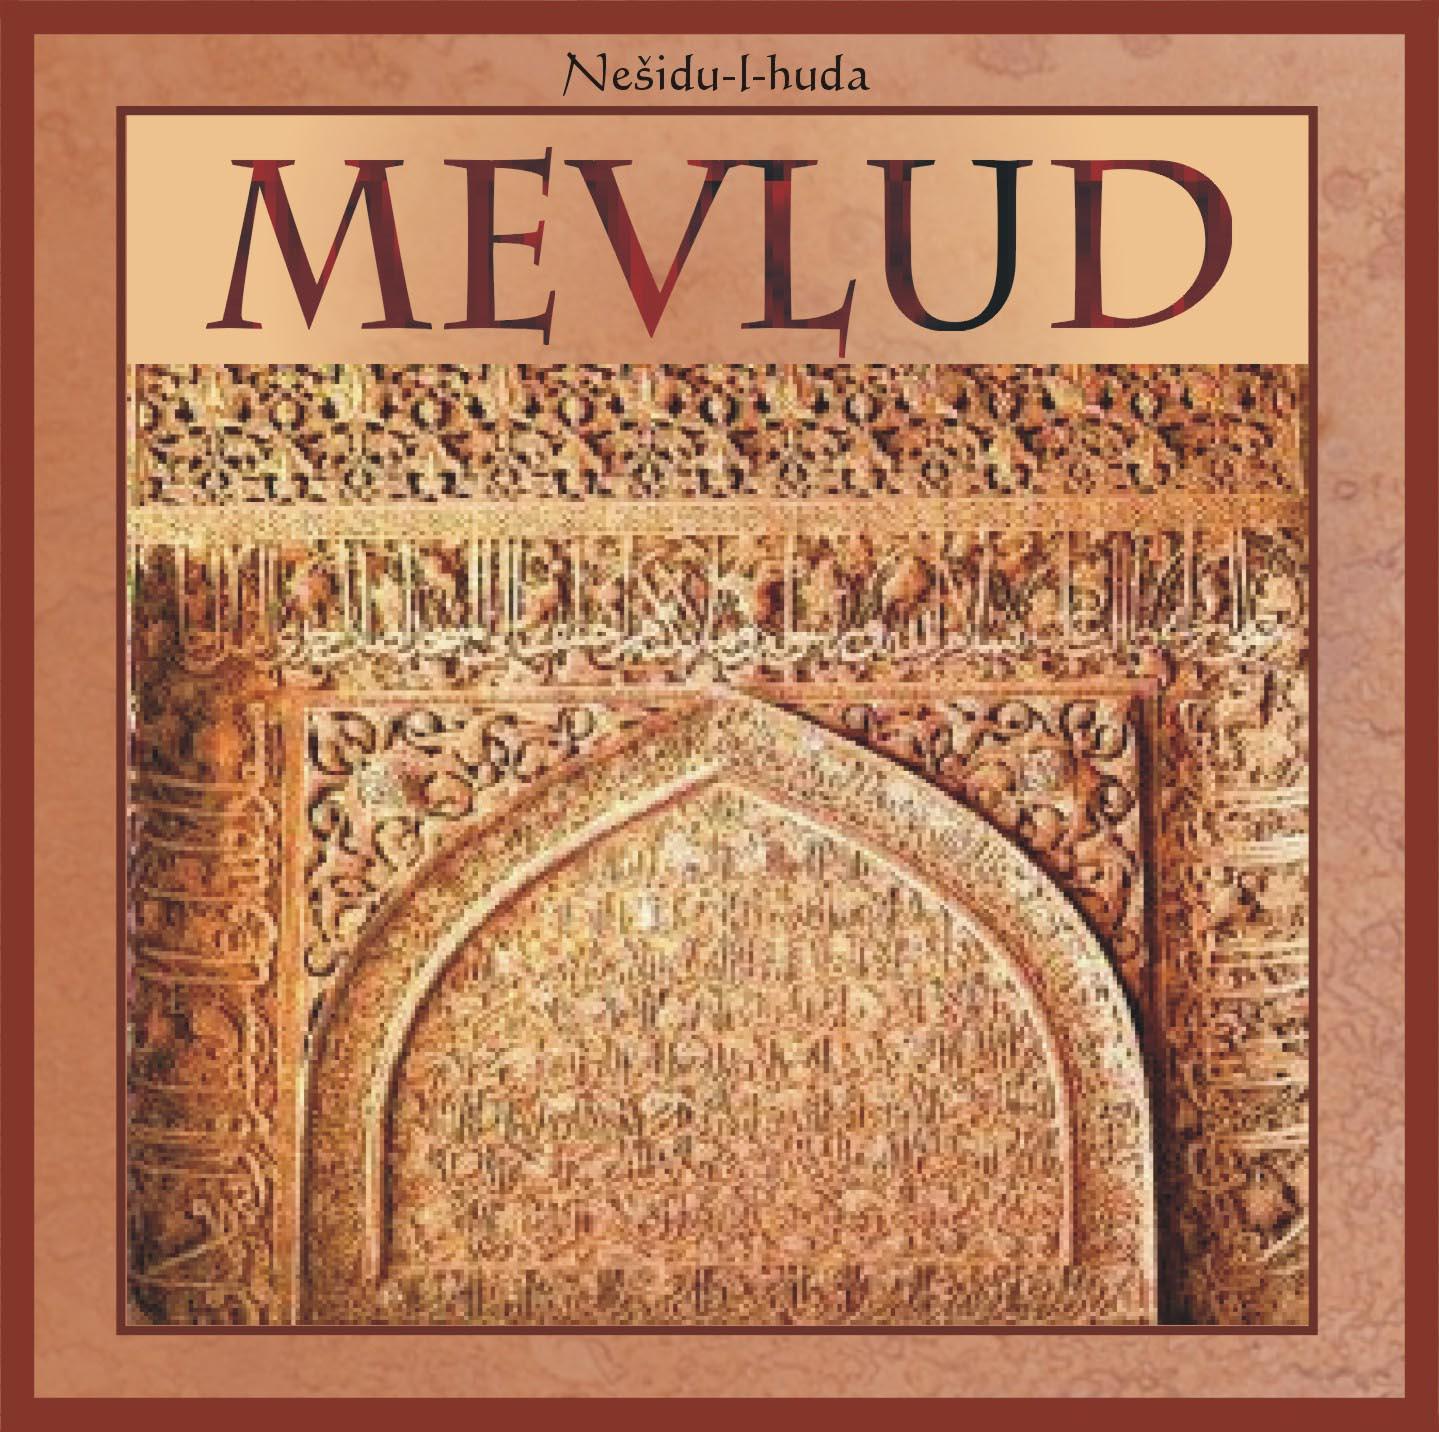 ISLAMIC CHANTS / MEVLUD - Nesidu-l-Huda